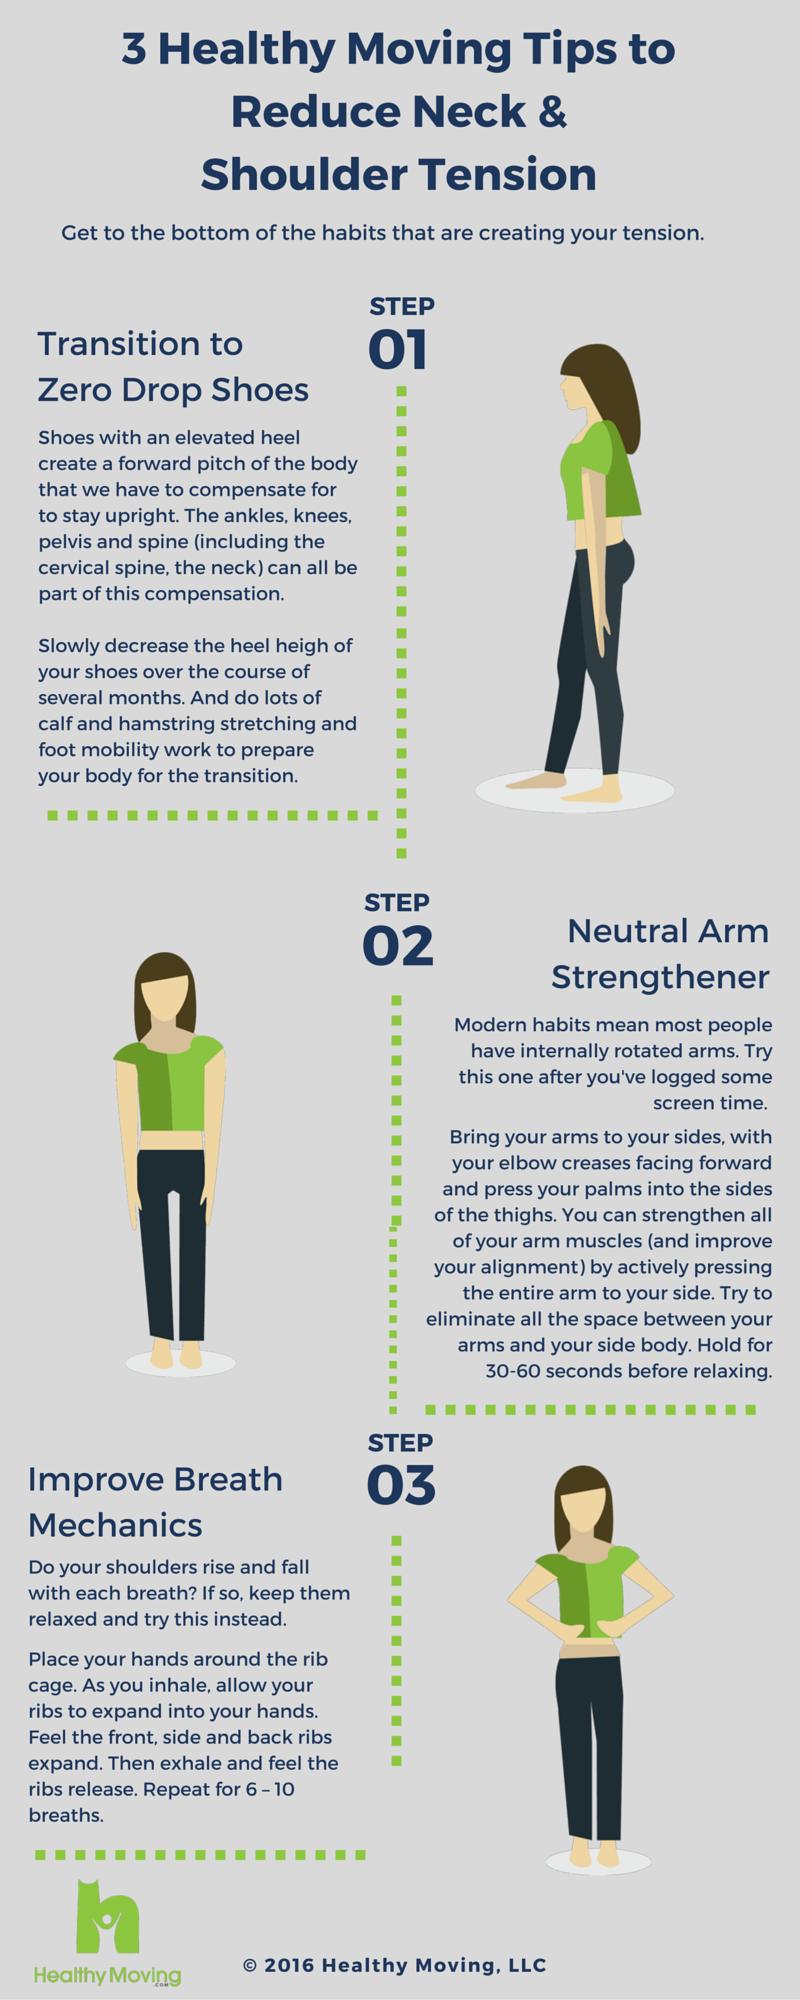 3 Tips to Reduce Neck & Shoulder Tension-3